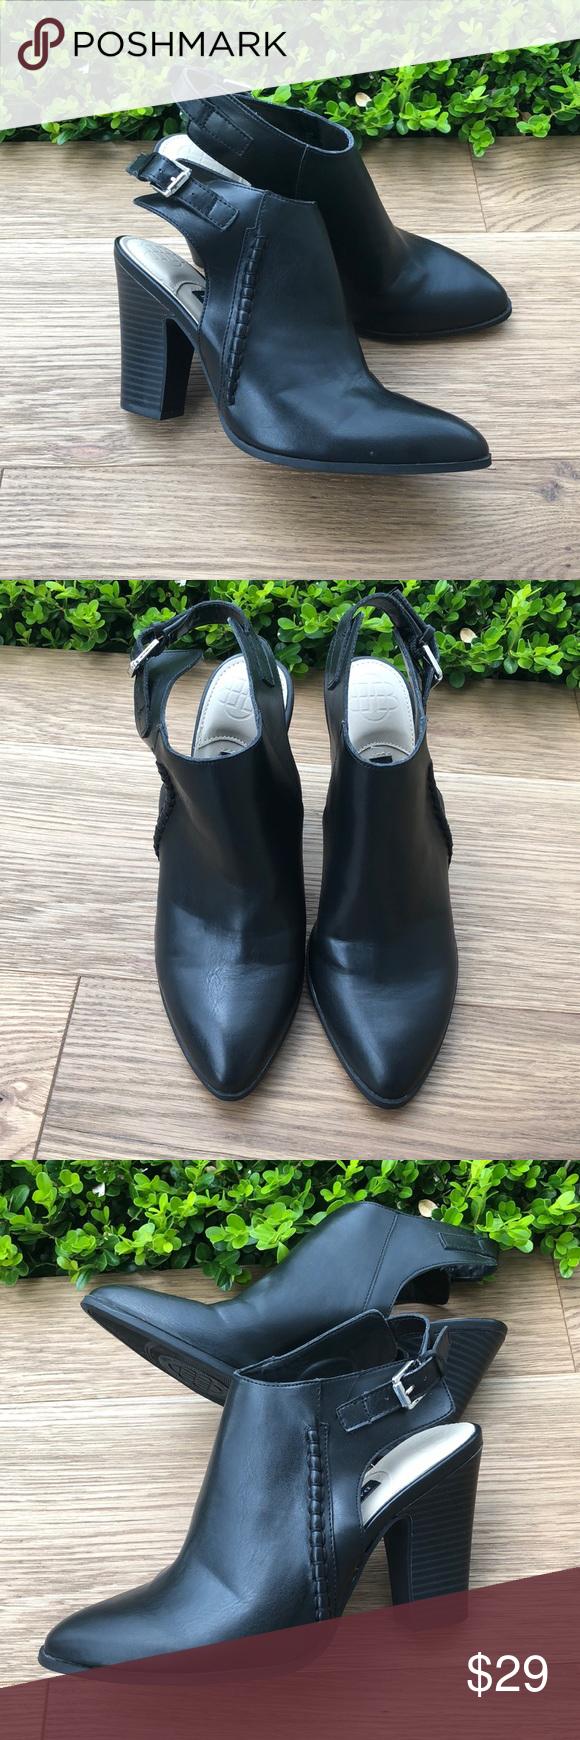 •Dana Buchman• Black Faux Leather Shoes Shoes women